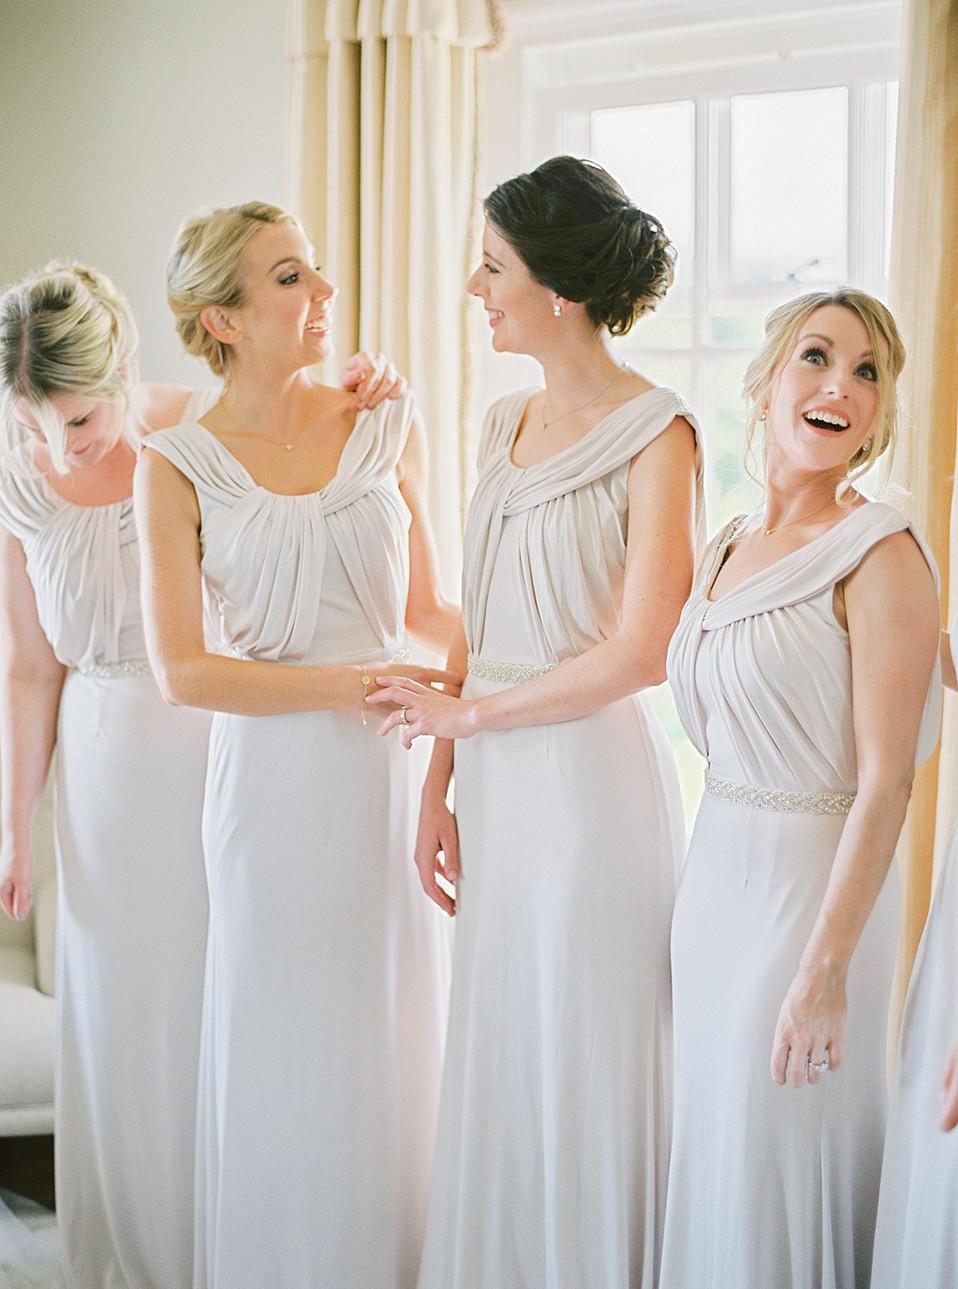 Luxury Wedding Planner & Florist   London & The Cotswolds   UK